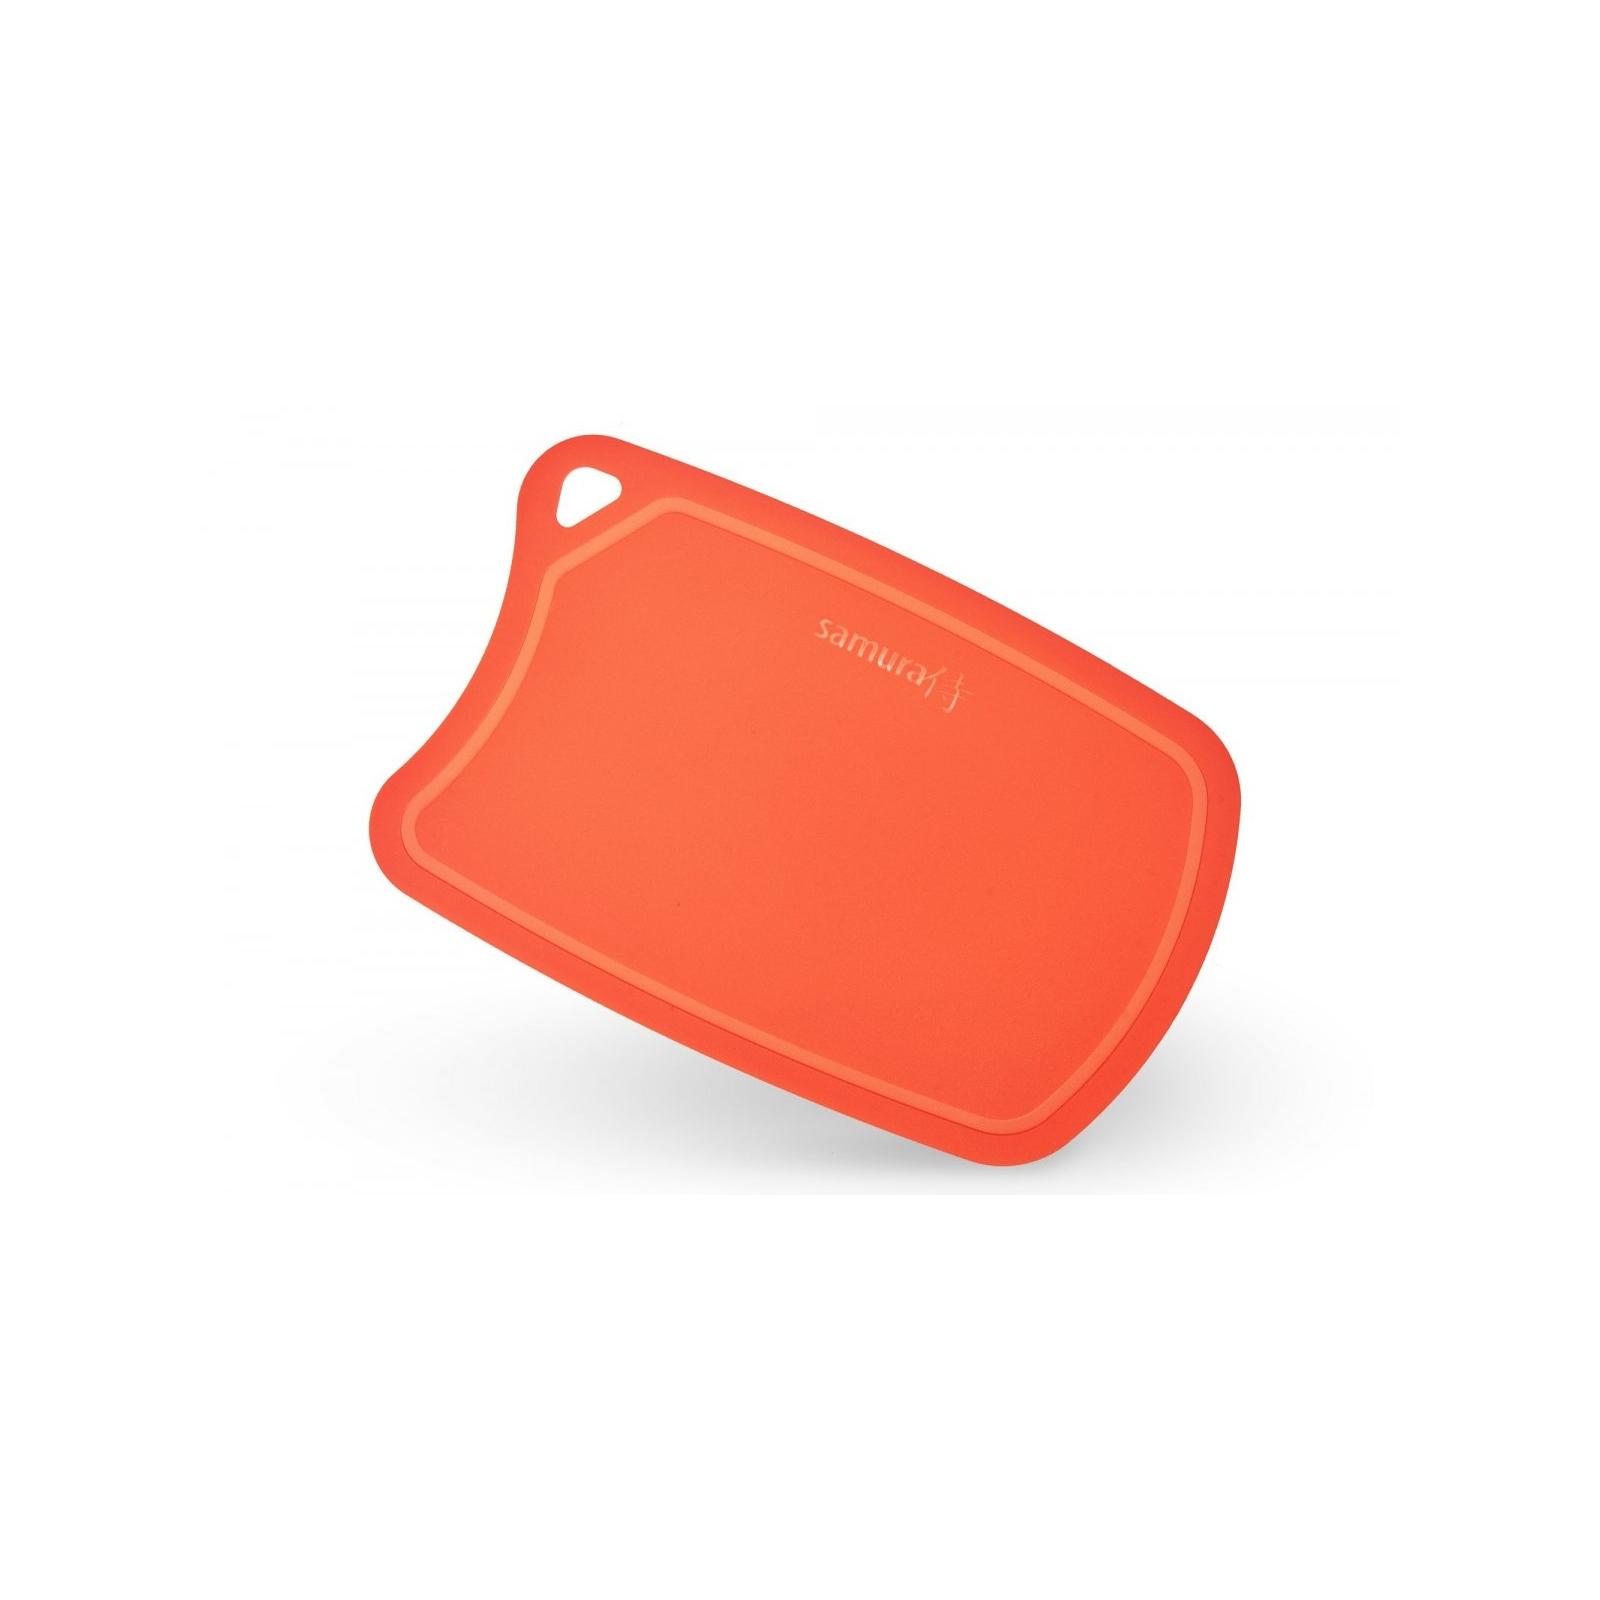 Samura termoplastikust lõikelaud, punane